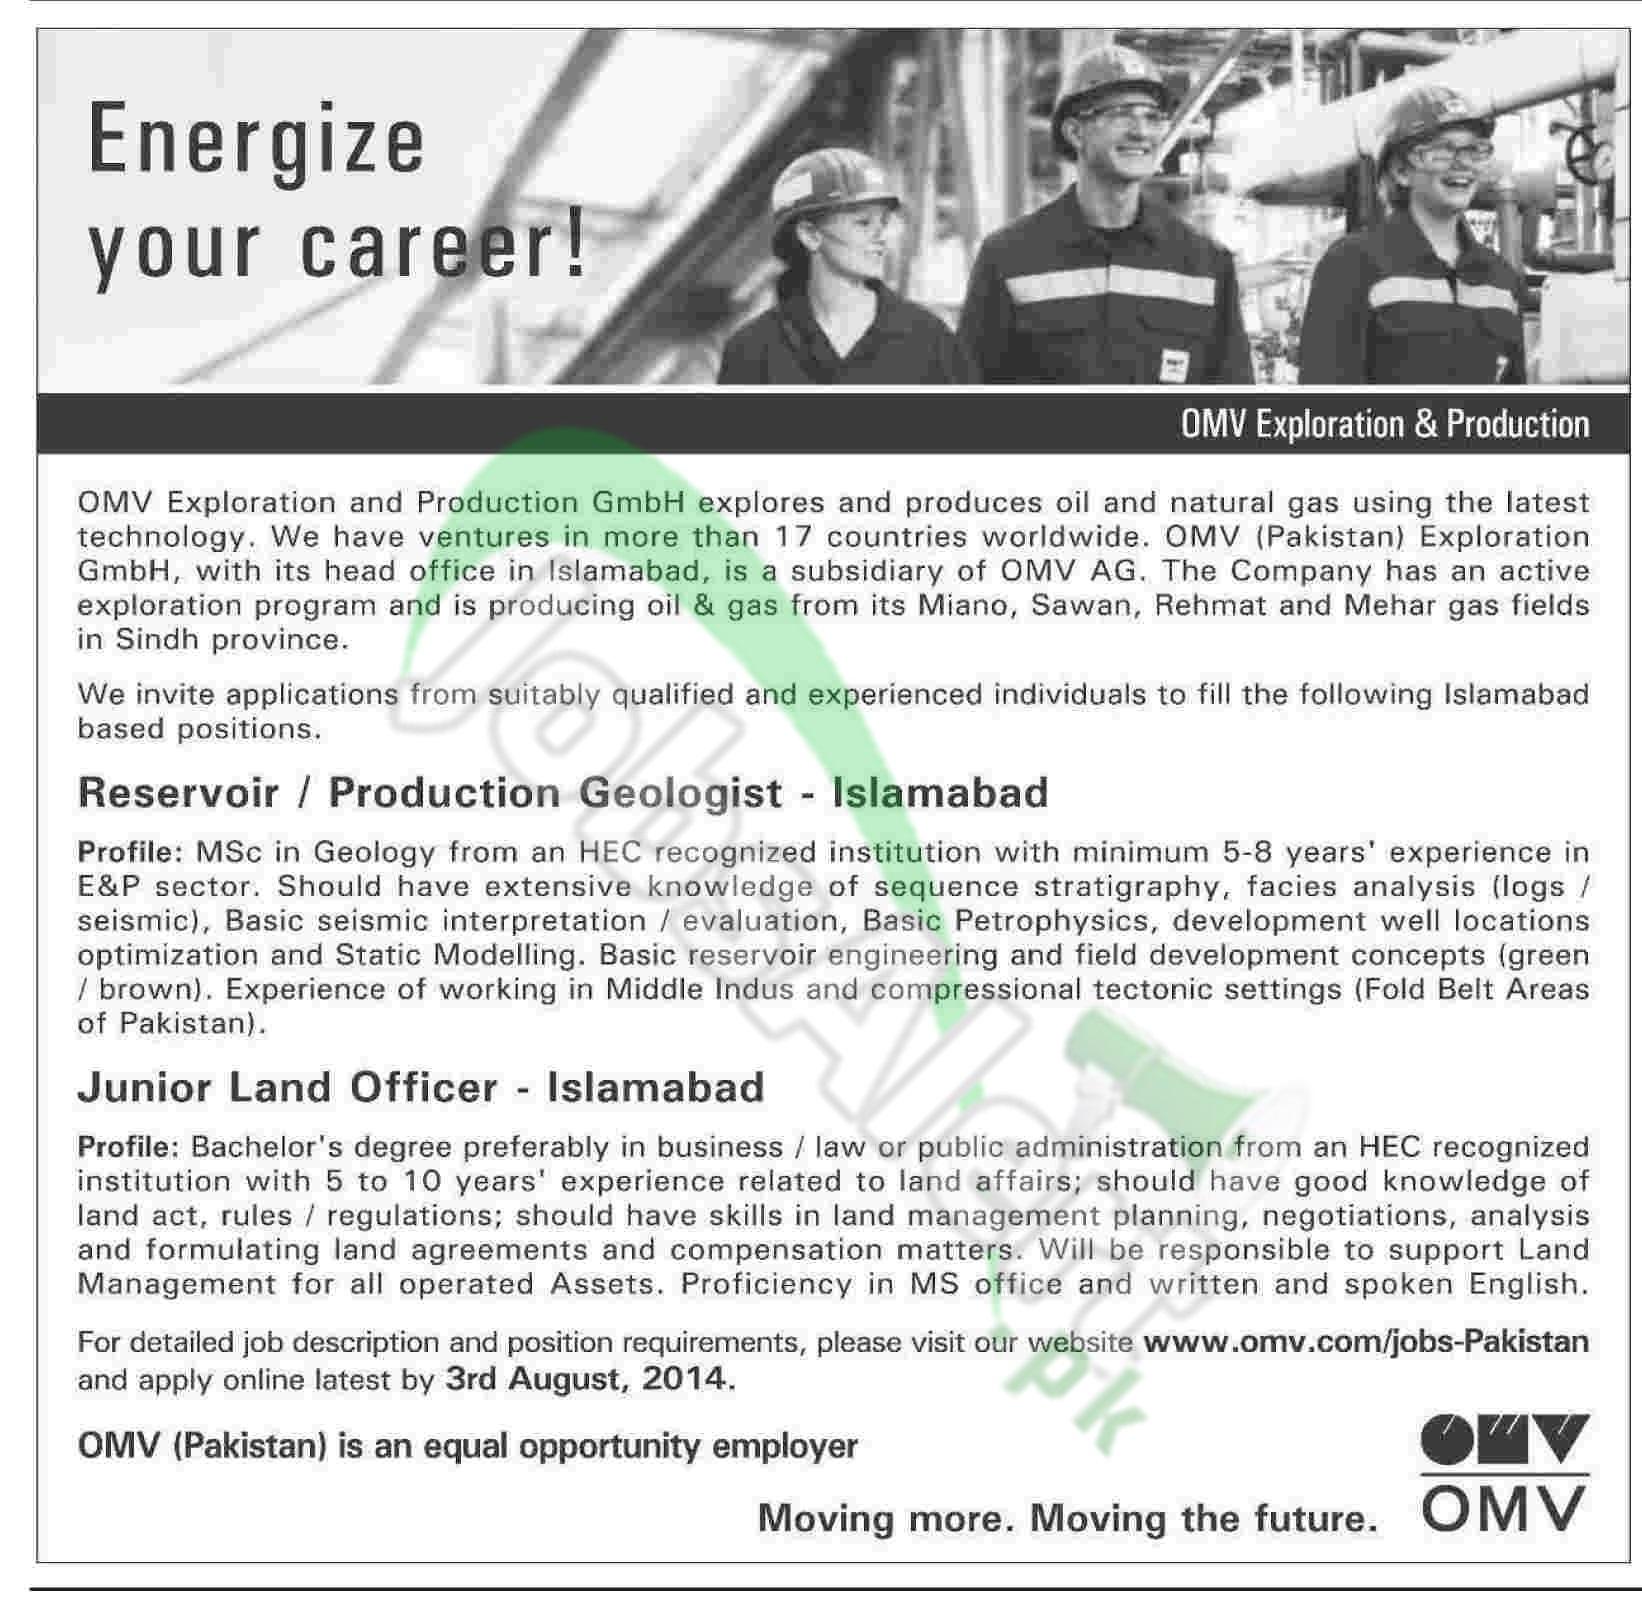 OMV Exploration and Production GmbH, Pakistan